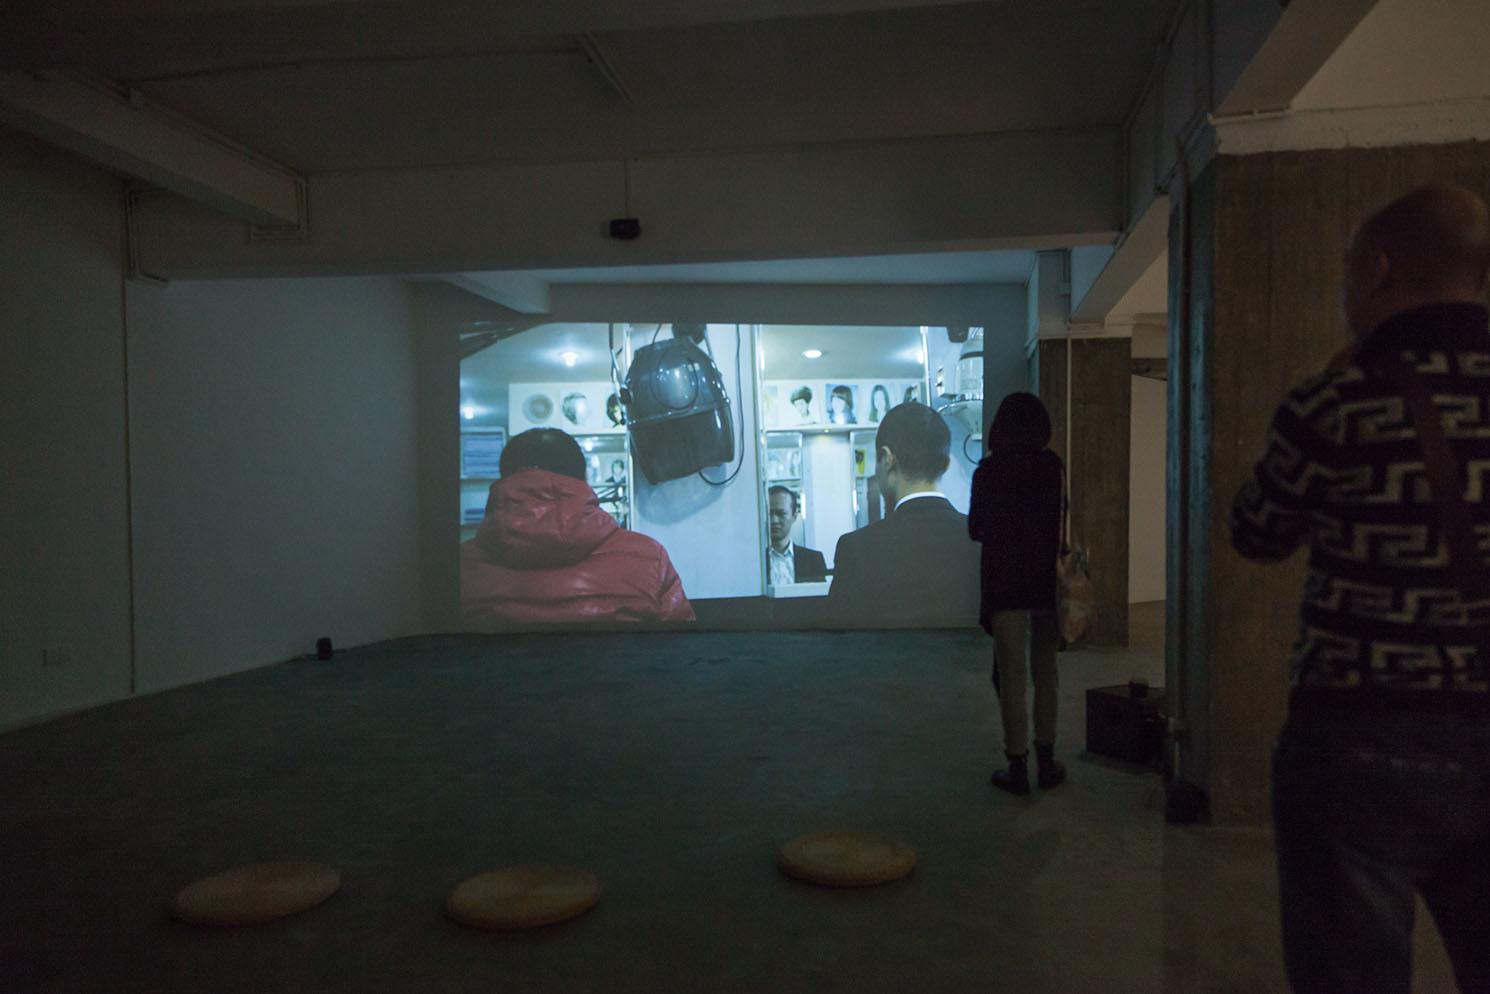 x03-展览现场 exhibition view